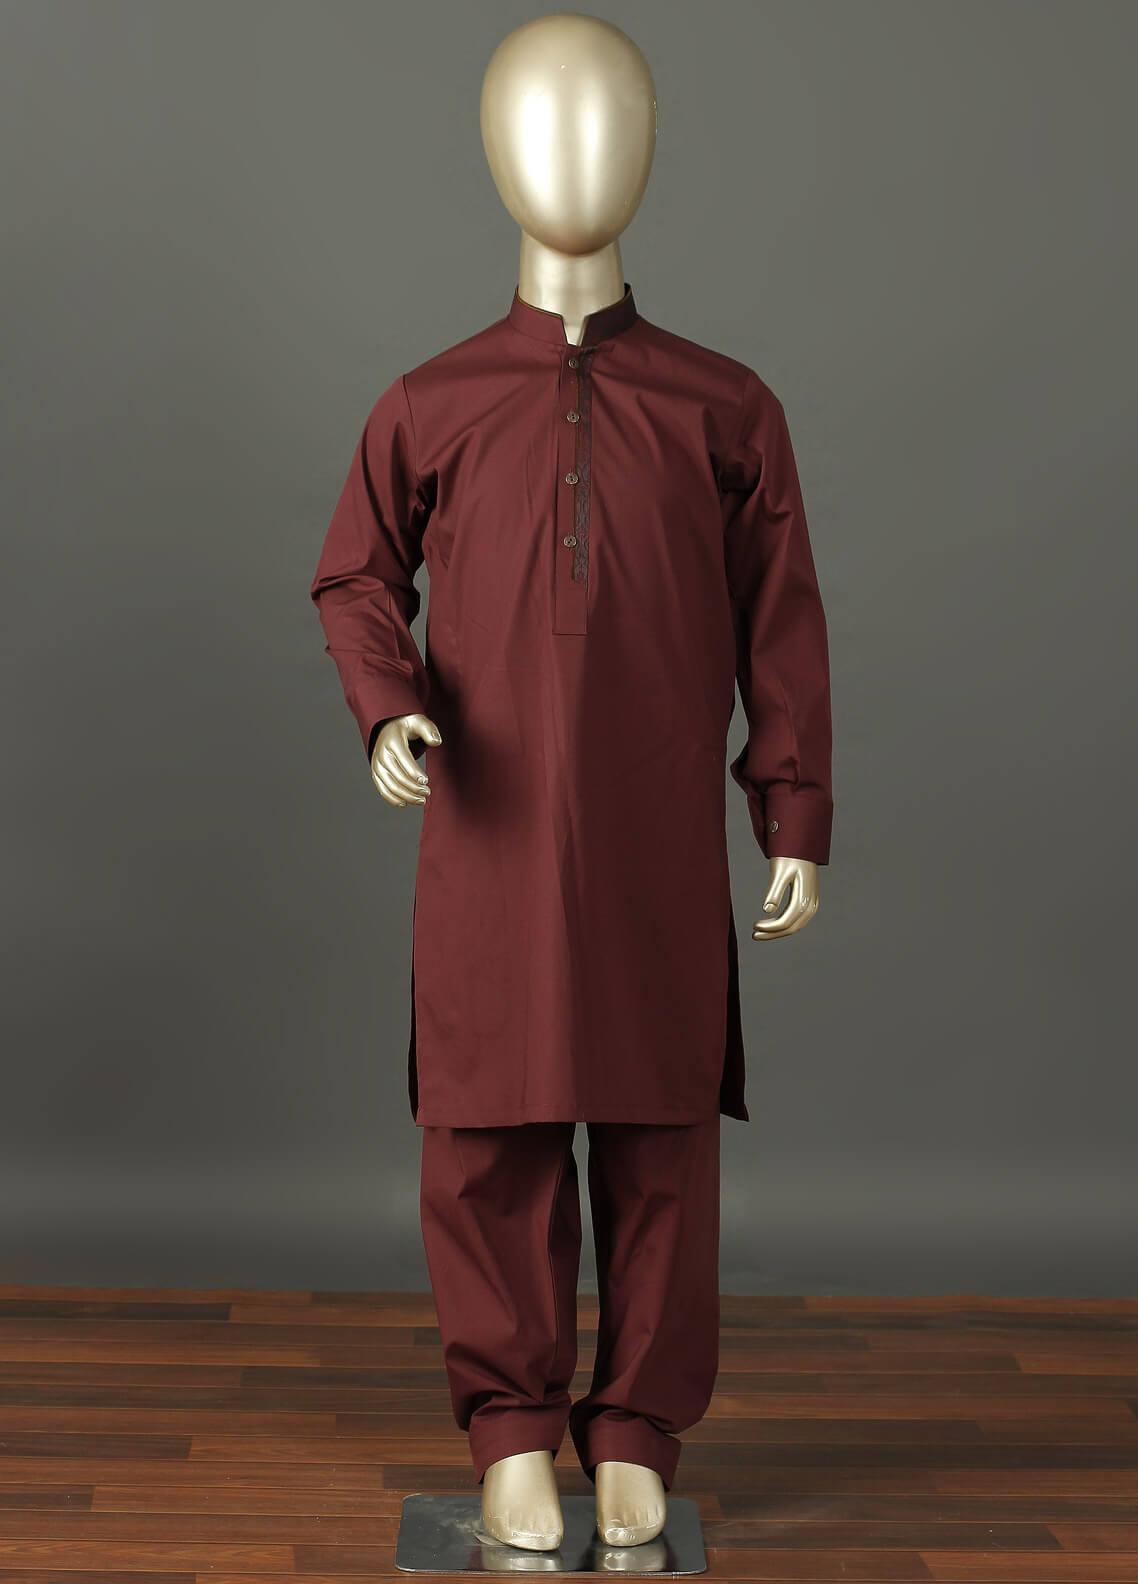 Aizaz Zafar Cotton Formal Boys Kameez Shalwar -  229 Maroon